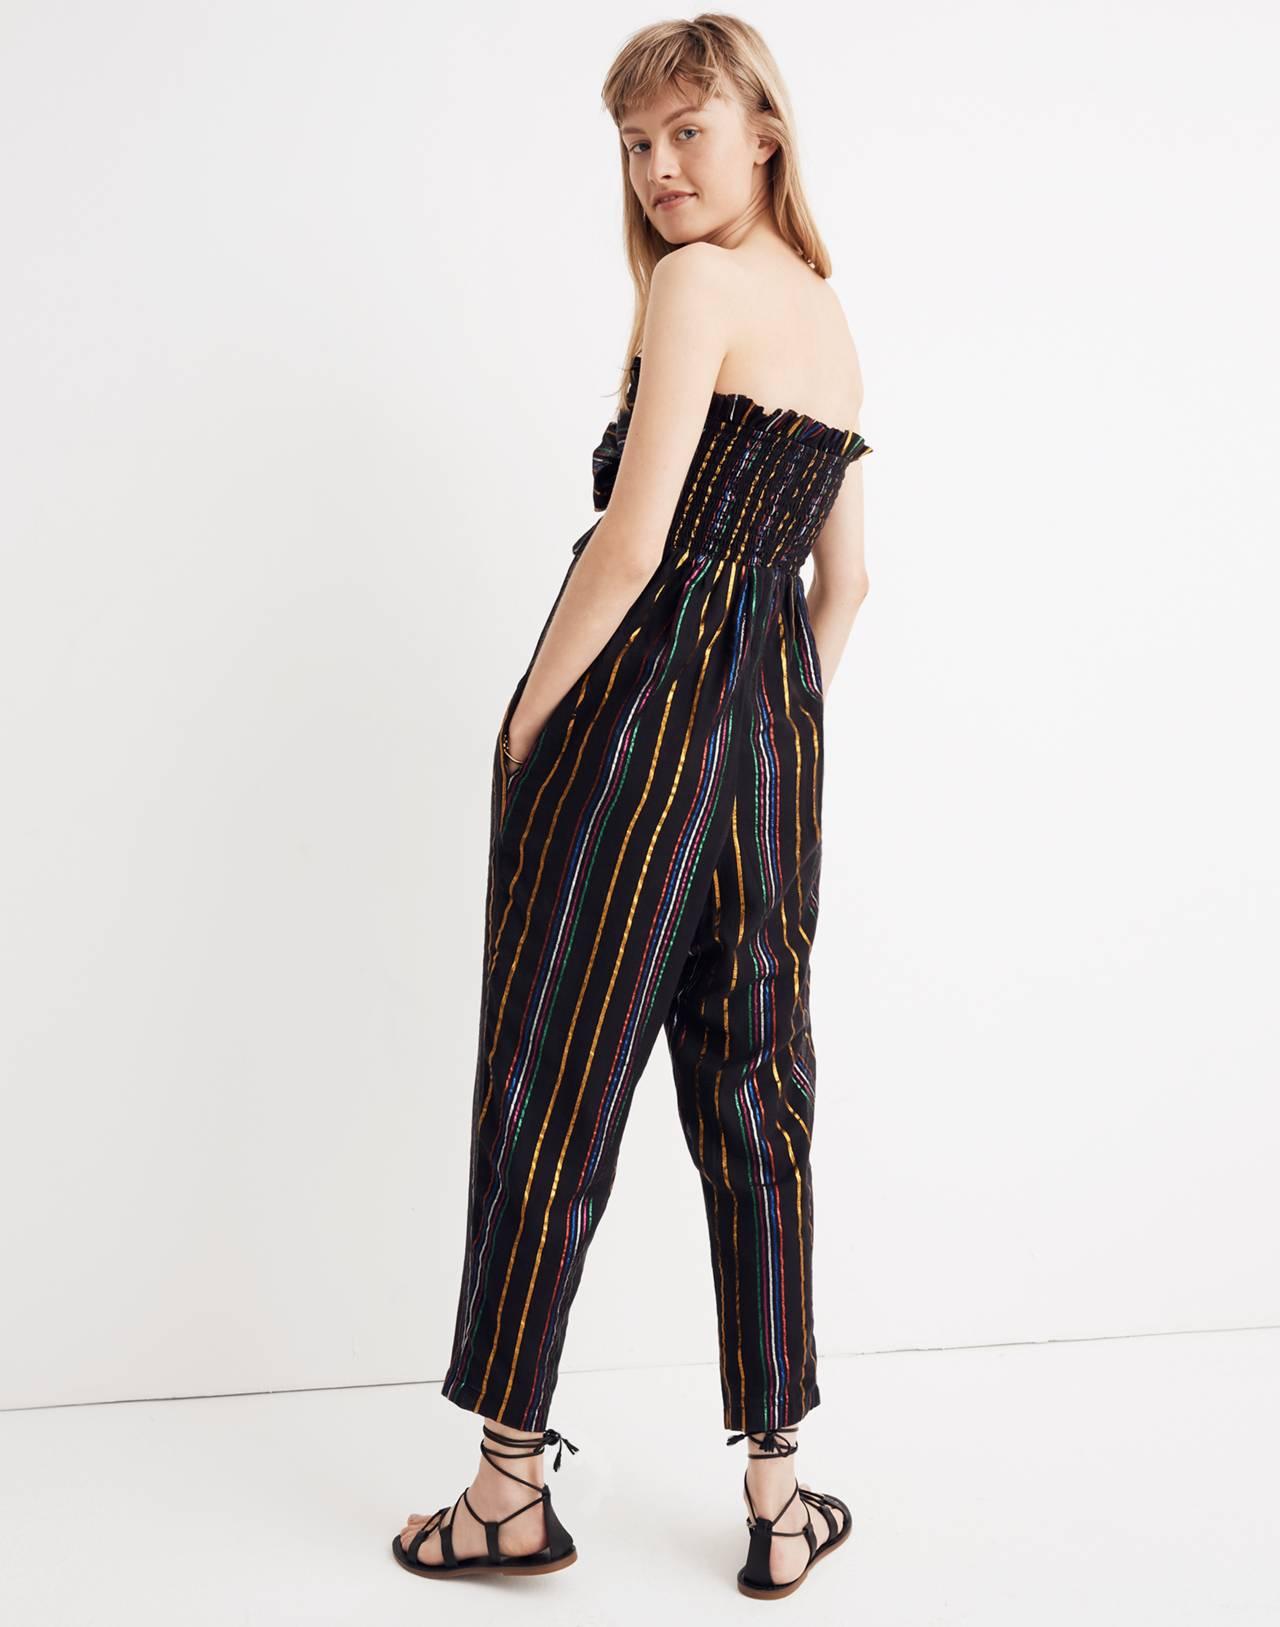 Apiece Apart™ Striped Zaza Gipsea Jumpsuit in black fez stripe image 3